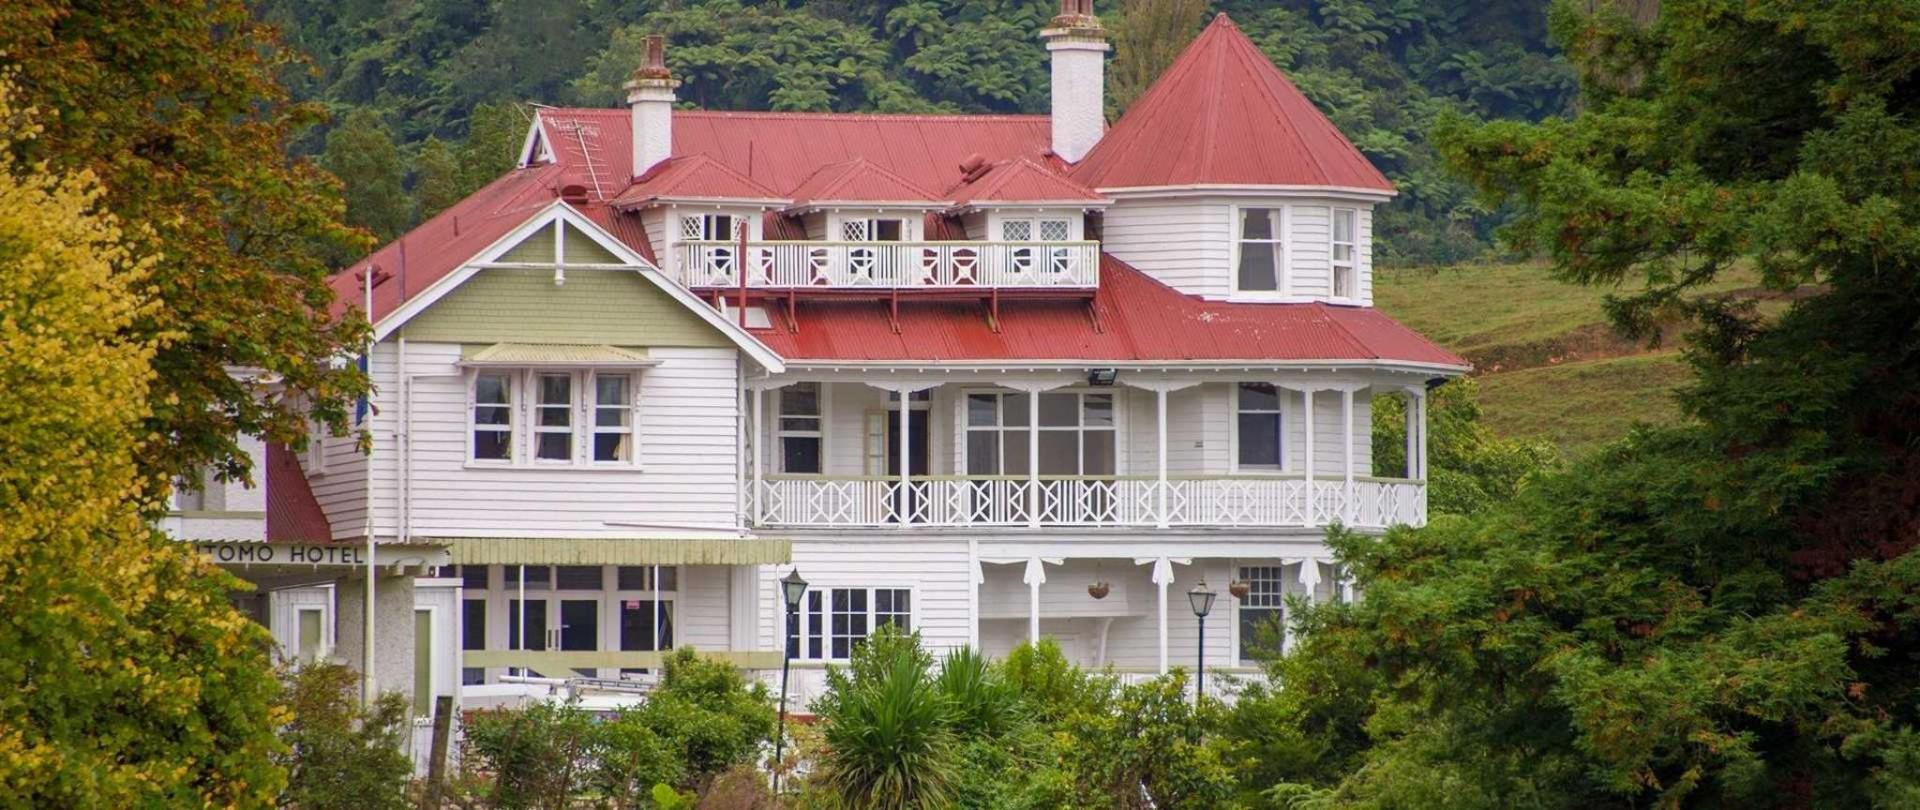 Waitomo Caves Hotel